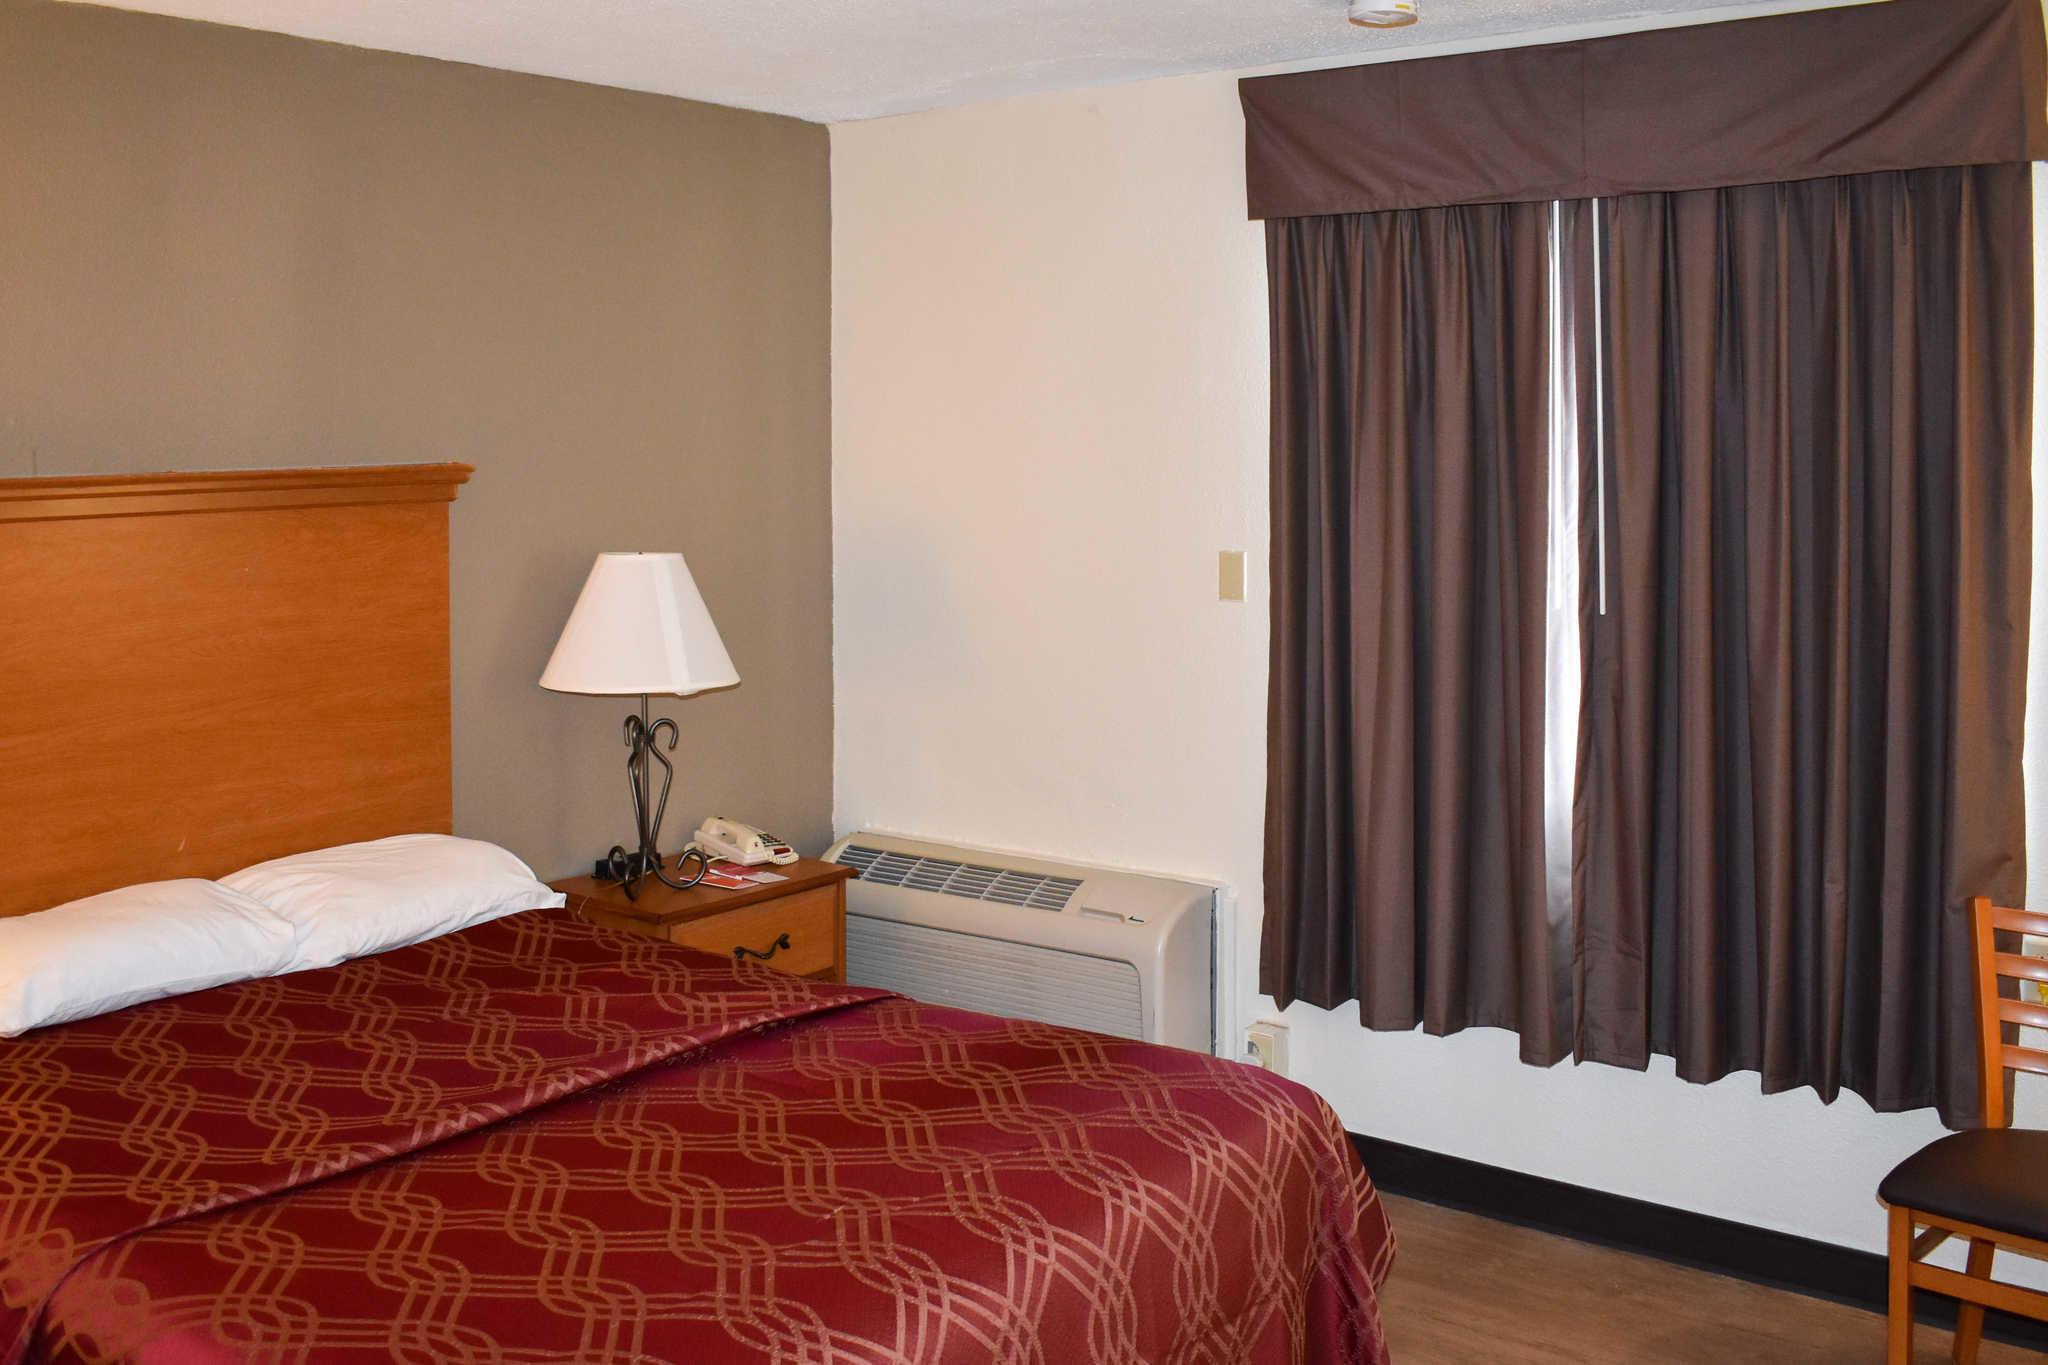 Econo Lodge Inn & Suites - Closed image 11